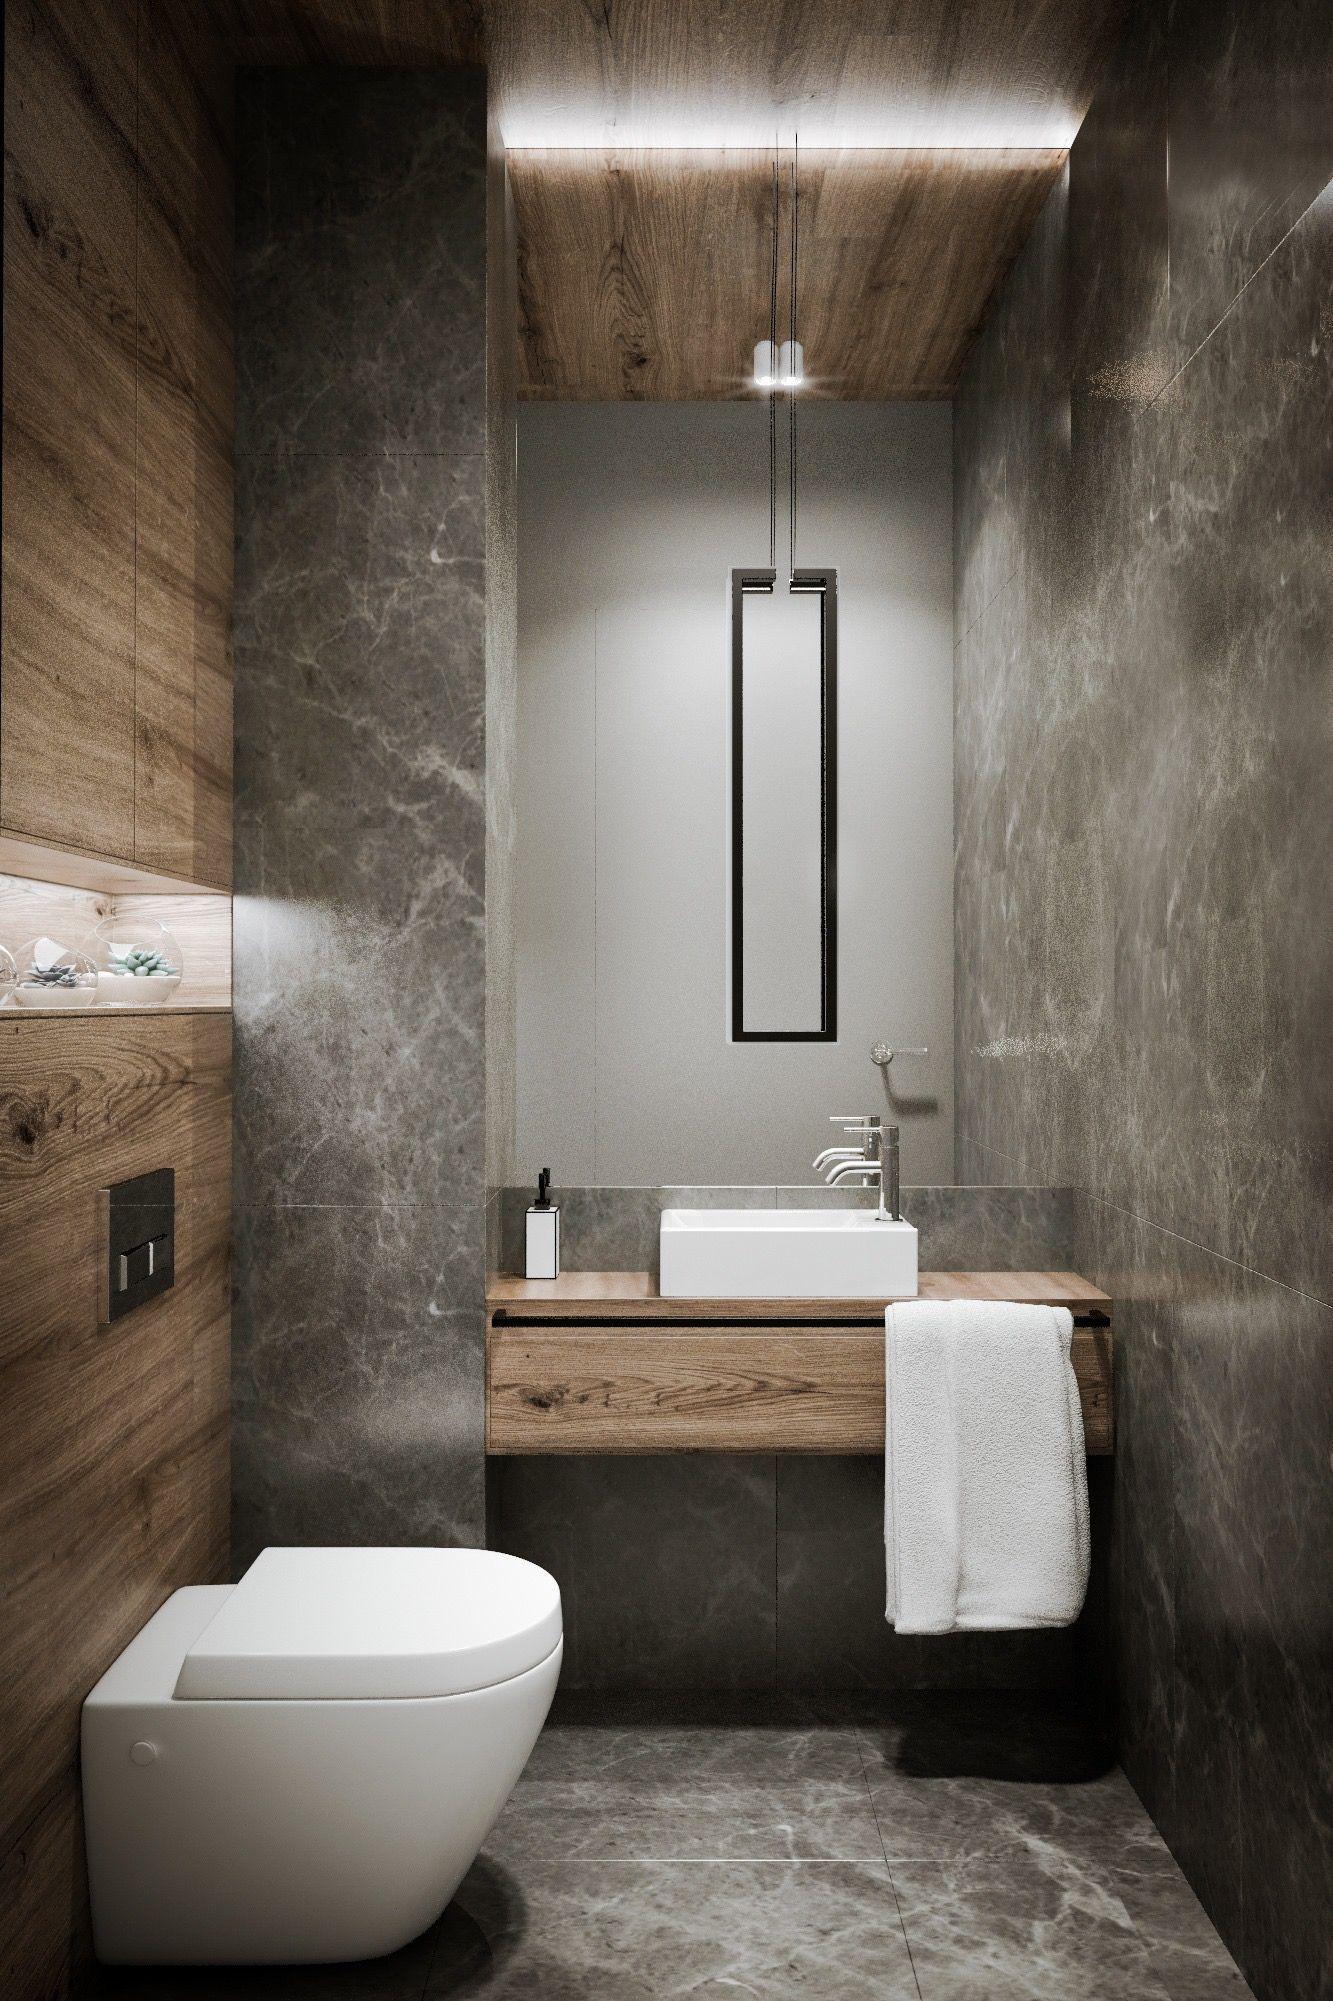 Inspiring 21 Best Plywood Bathroom Https Decorisme Co 2018 04 13 21 Best Plywood Bathroom The Ma Small Bathroom Remodel Toilet Design Modern Bathroom Design